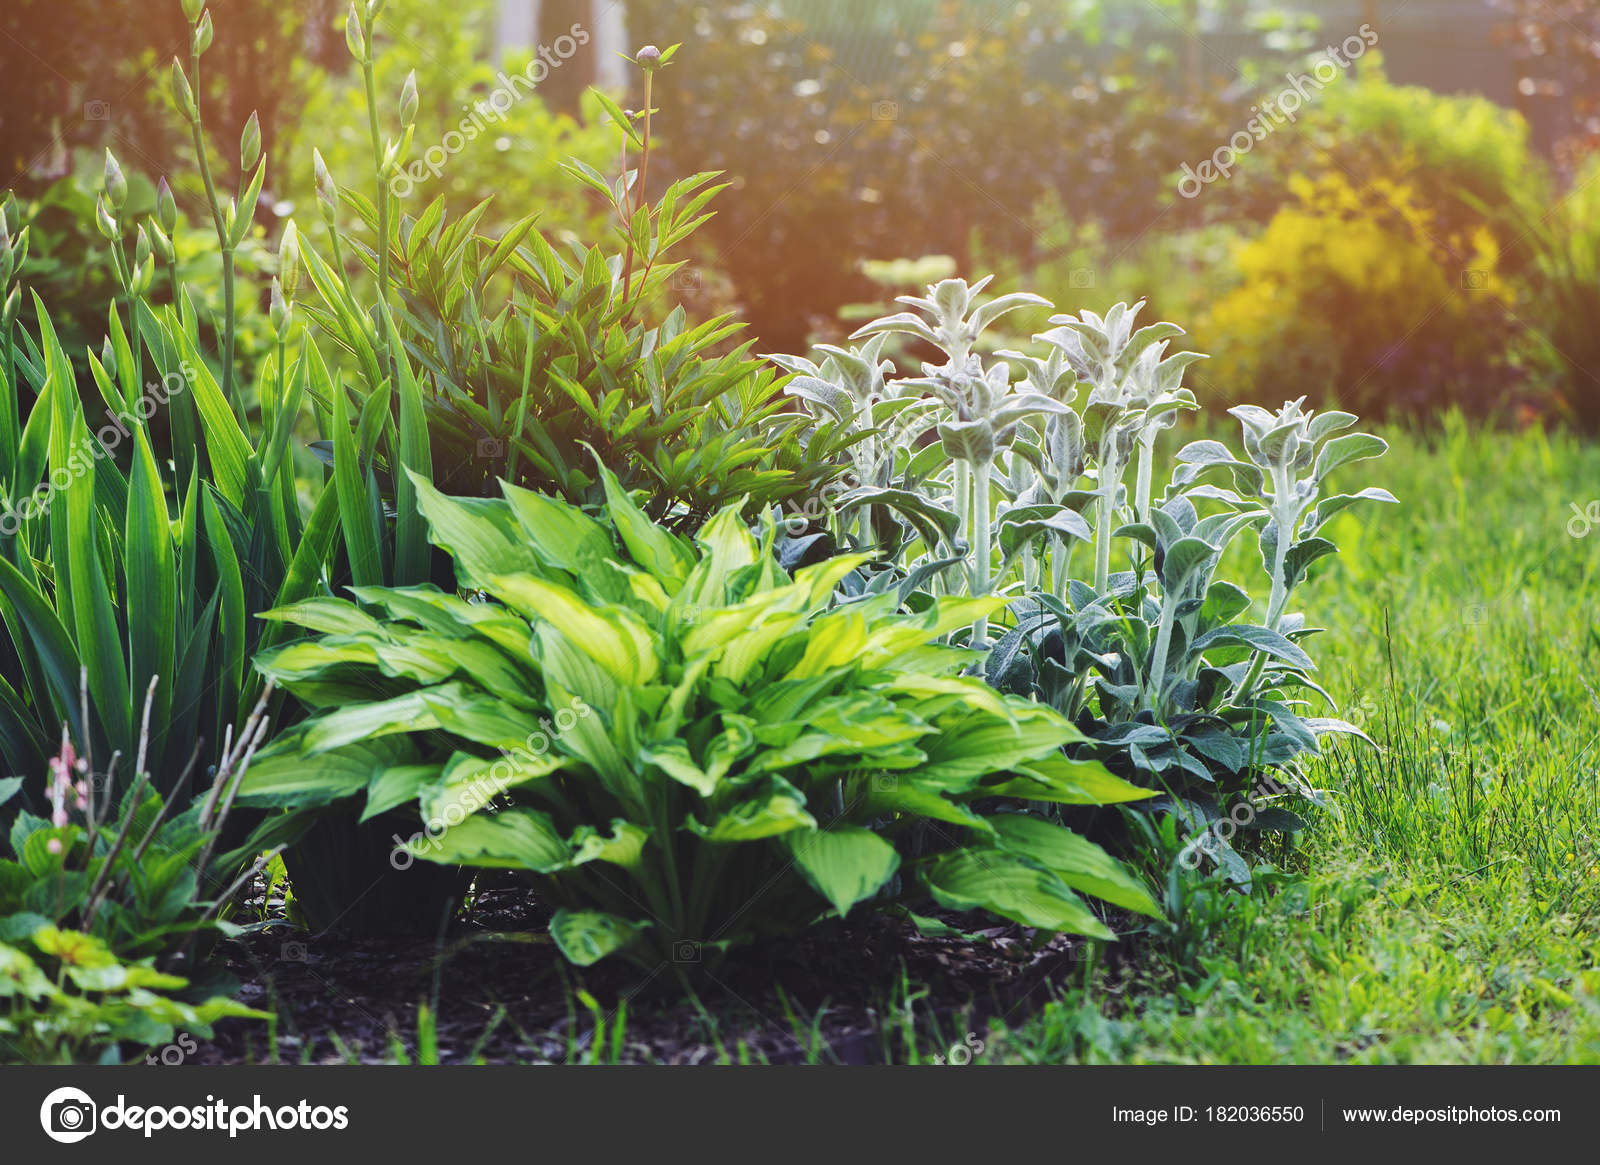 Pianta Orecchie Di Agnello stachys byzantina lamb ears planted flowerbed hostas other